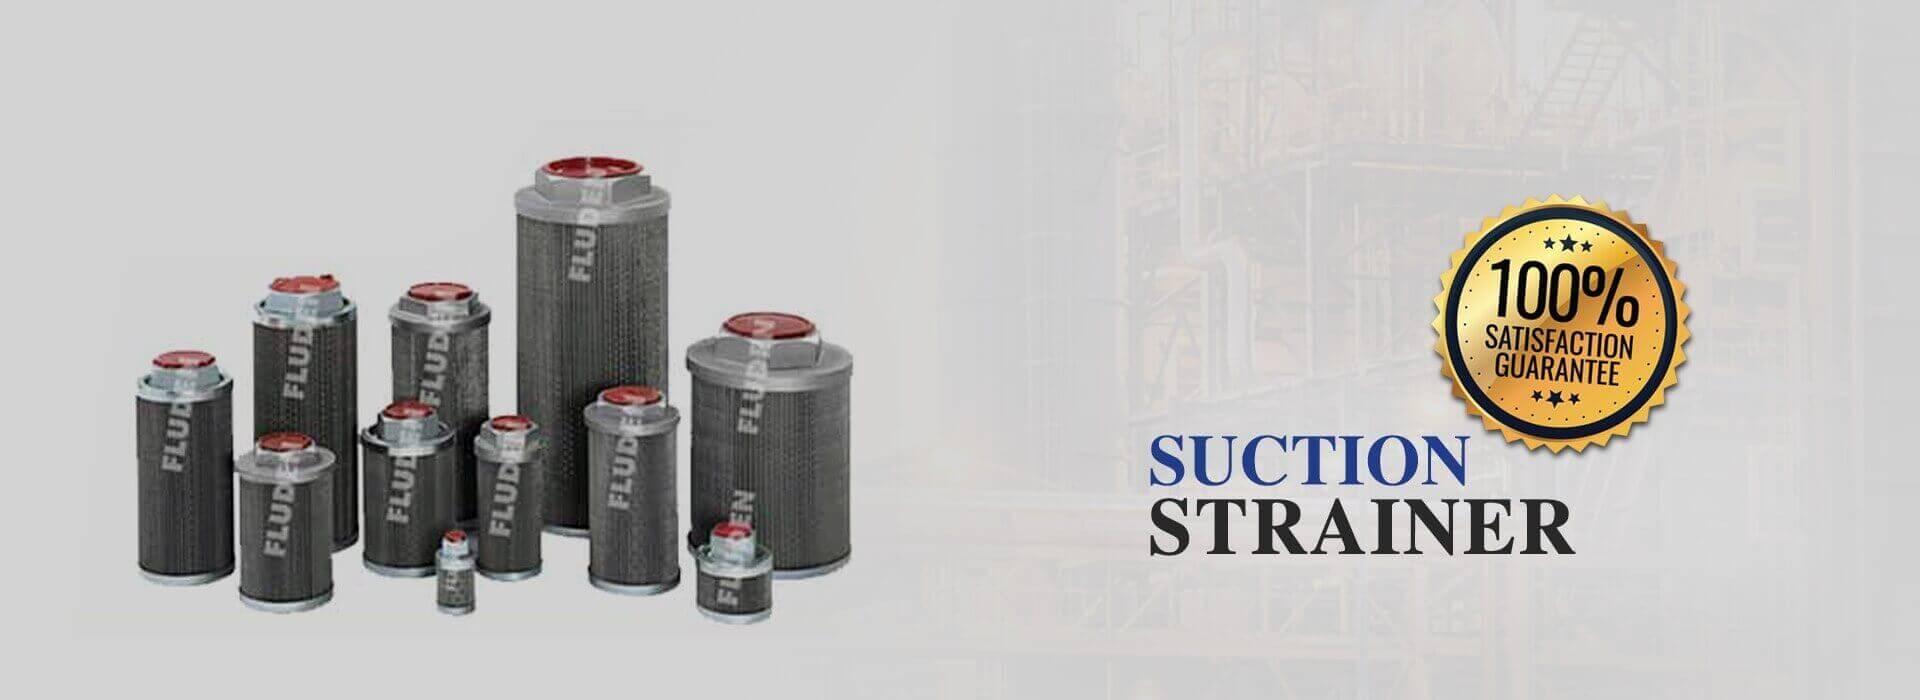 Inline Filter Elements, Suction Strainer